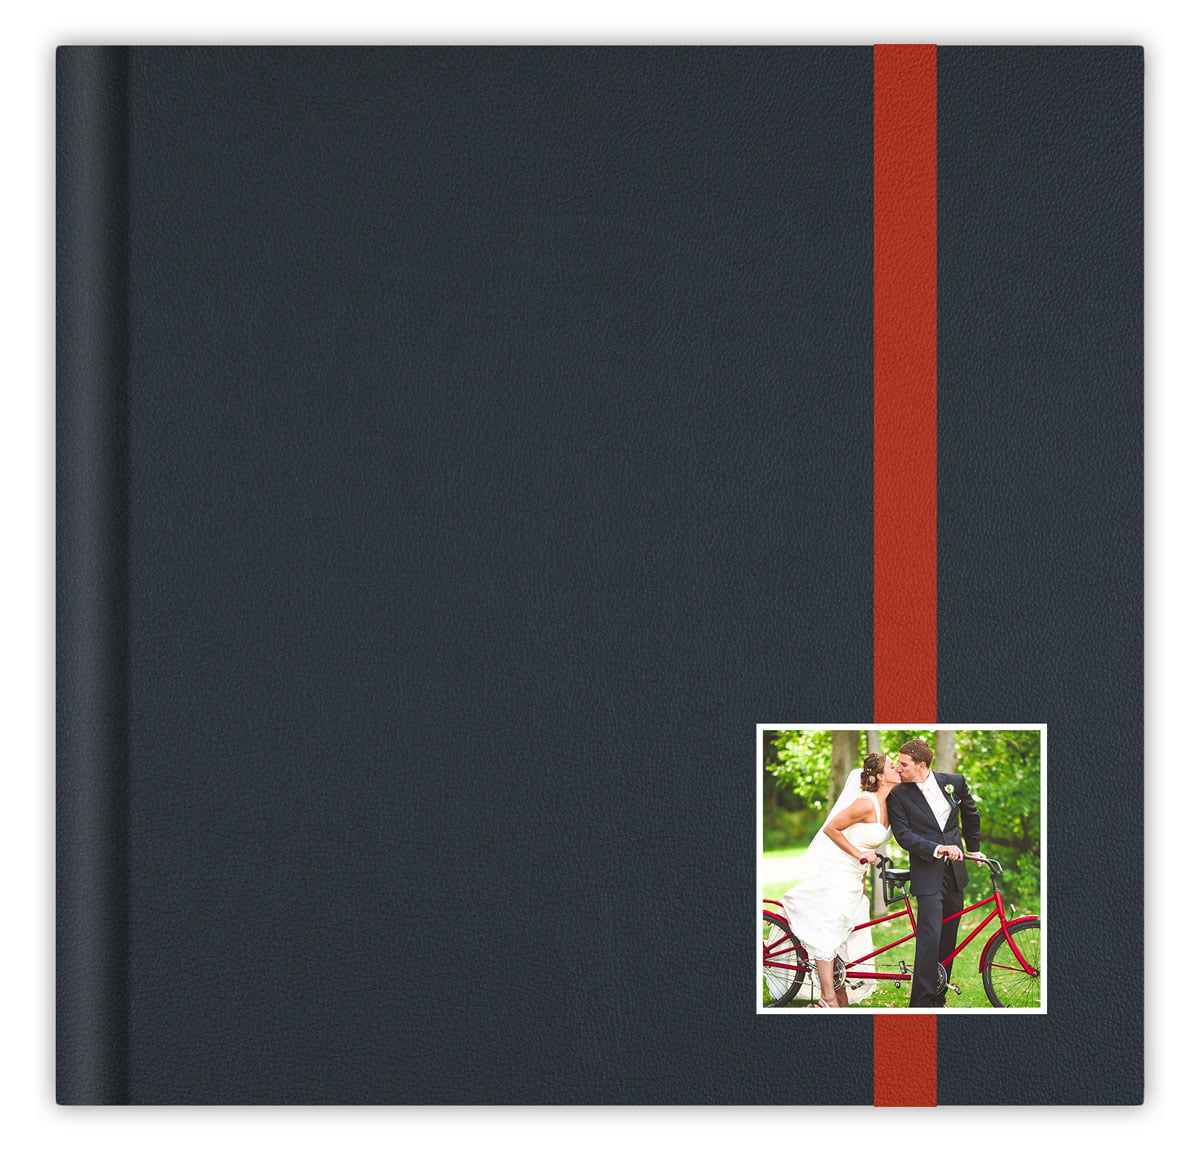 Zookbinders – PhotoBook Plus with Splash Cameo